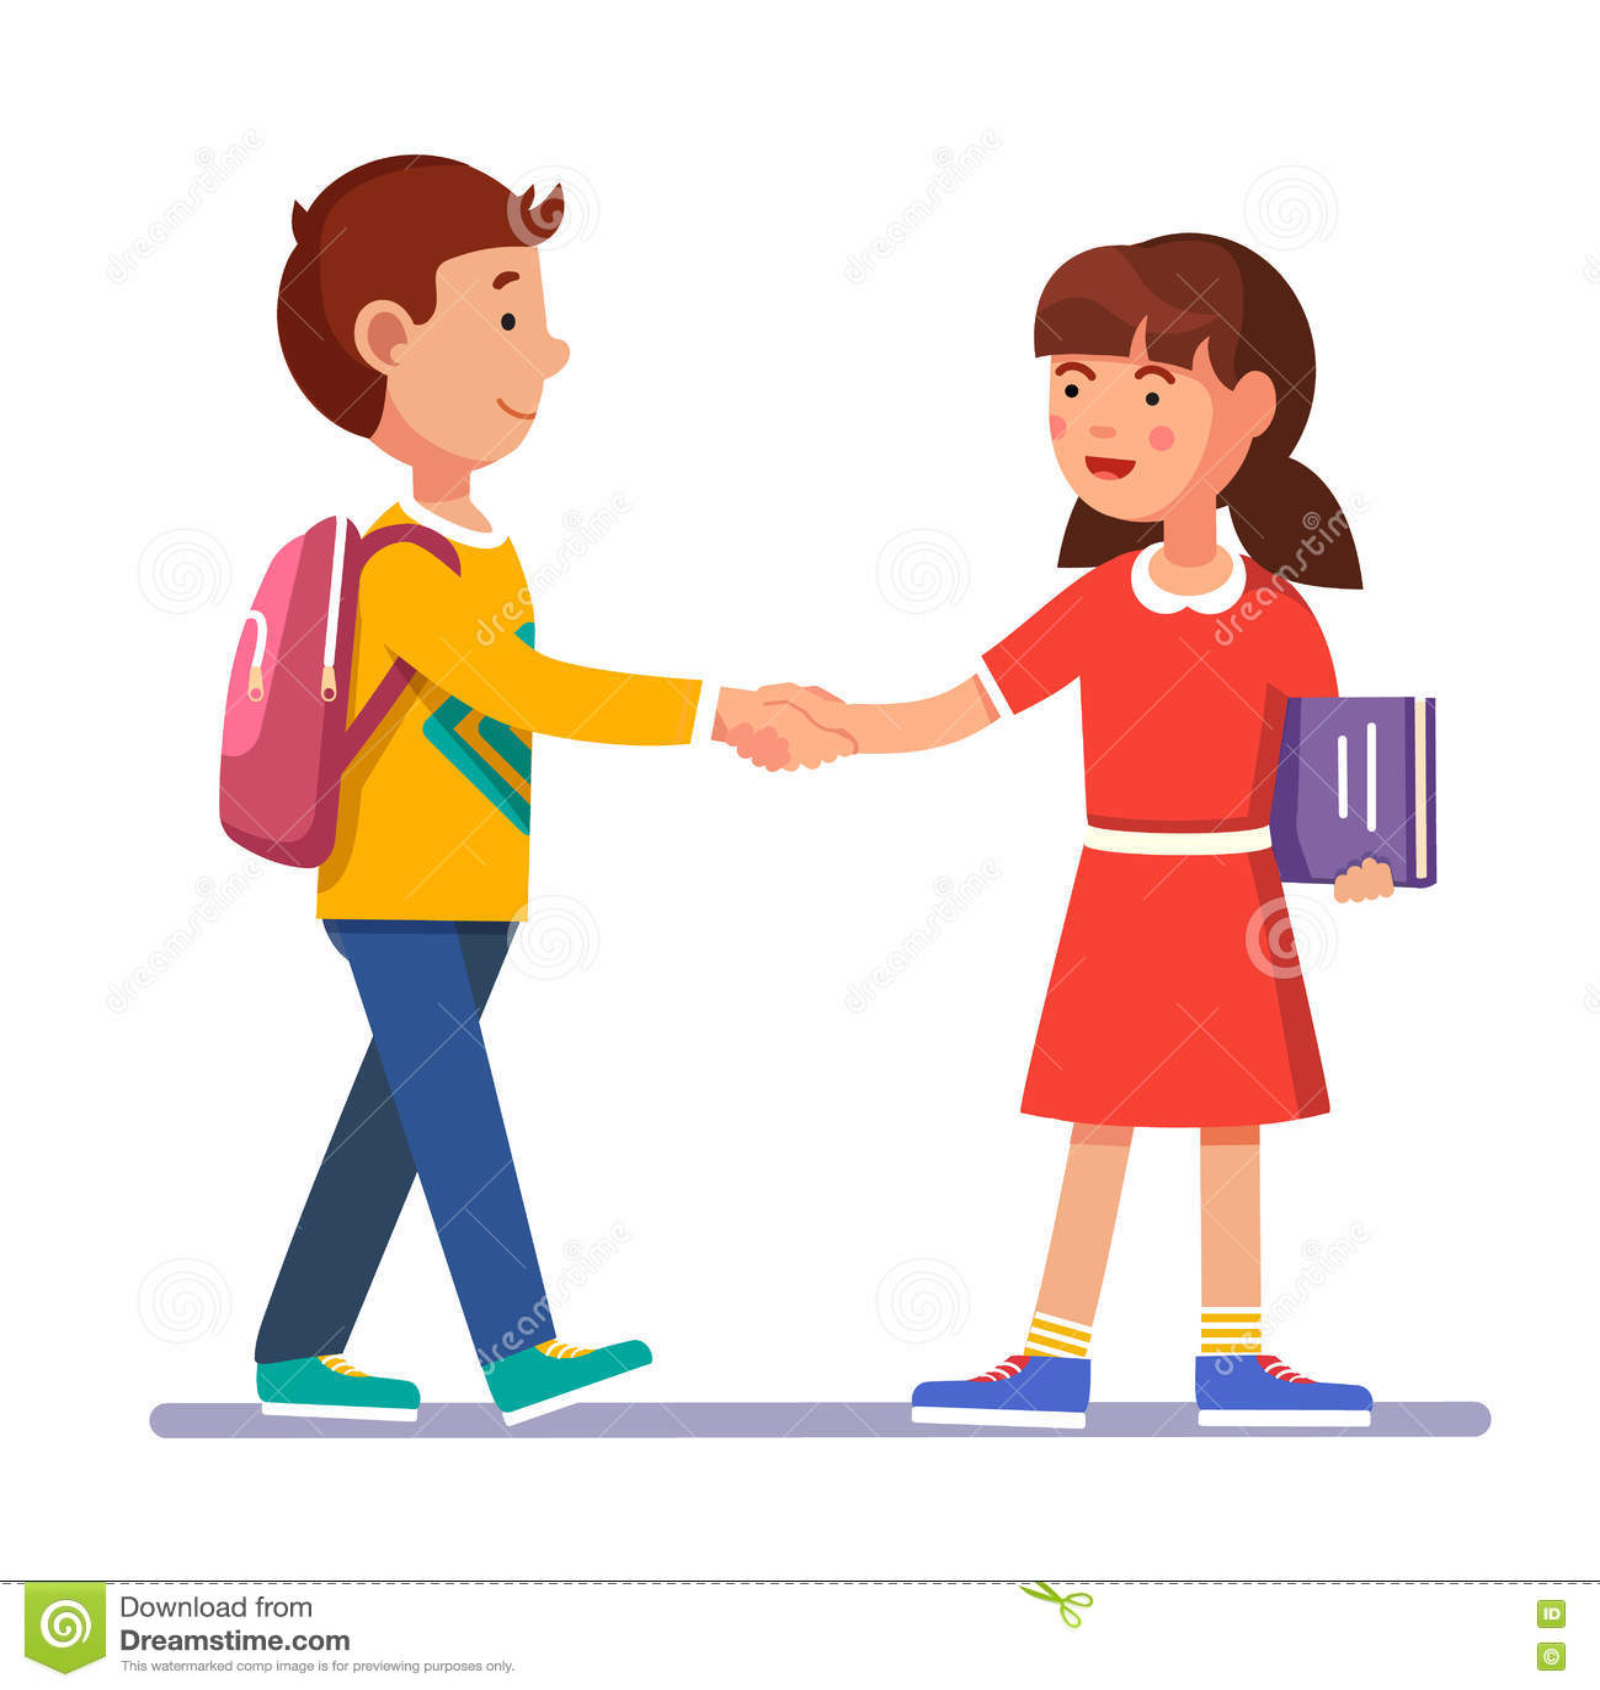 children handshake clipart - photo #19